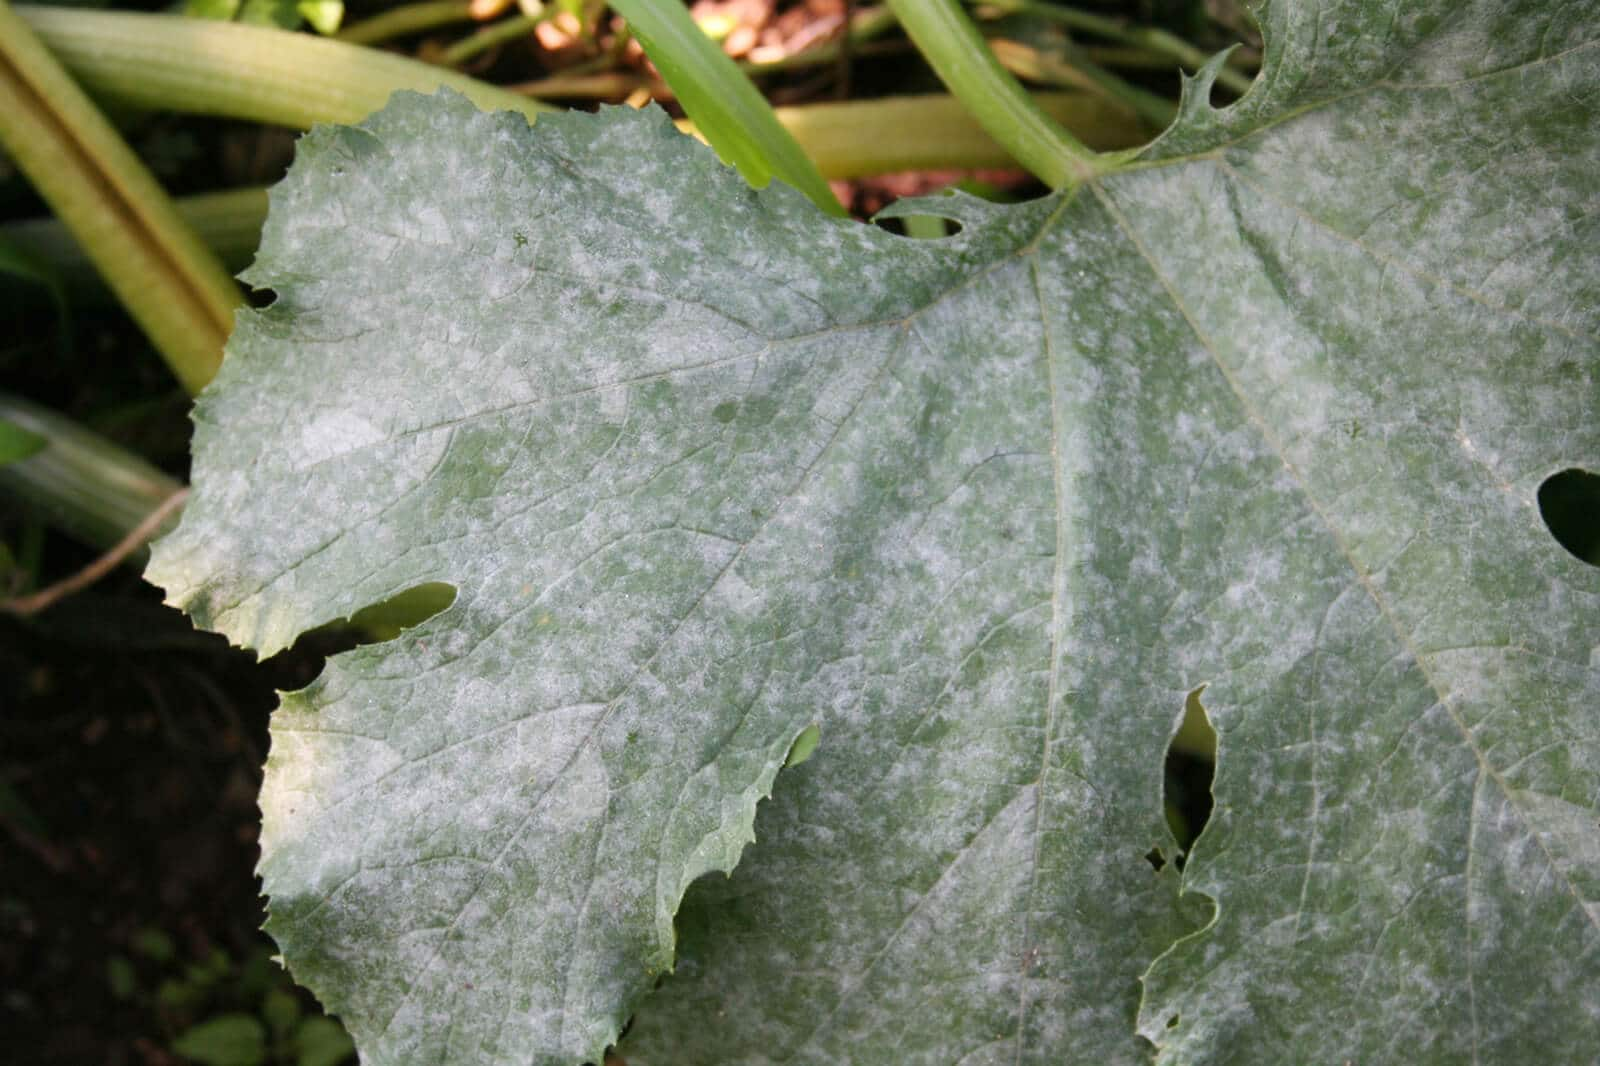 powdery mildew on zucchini leaf